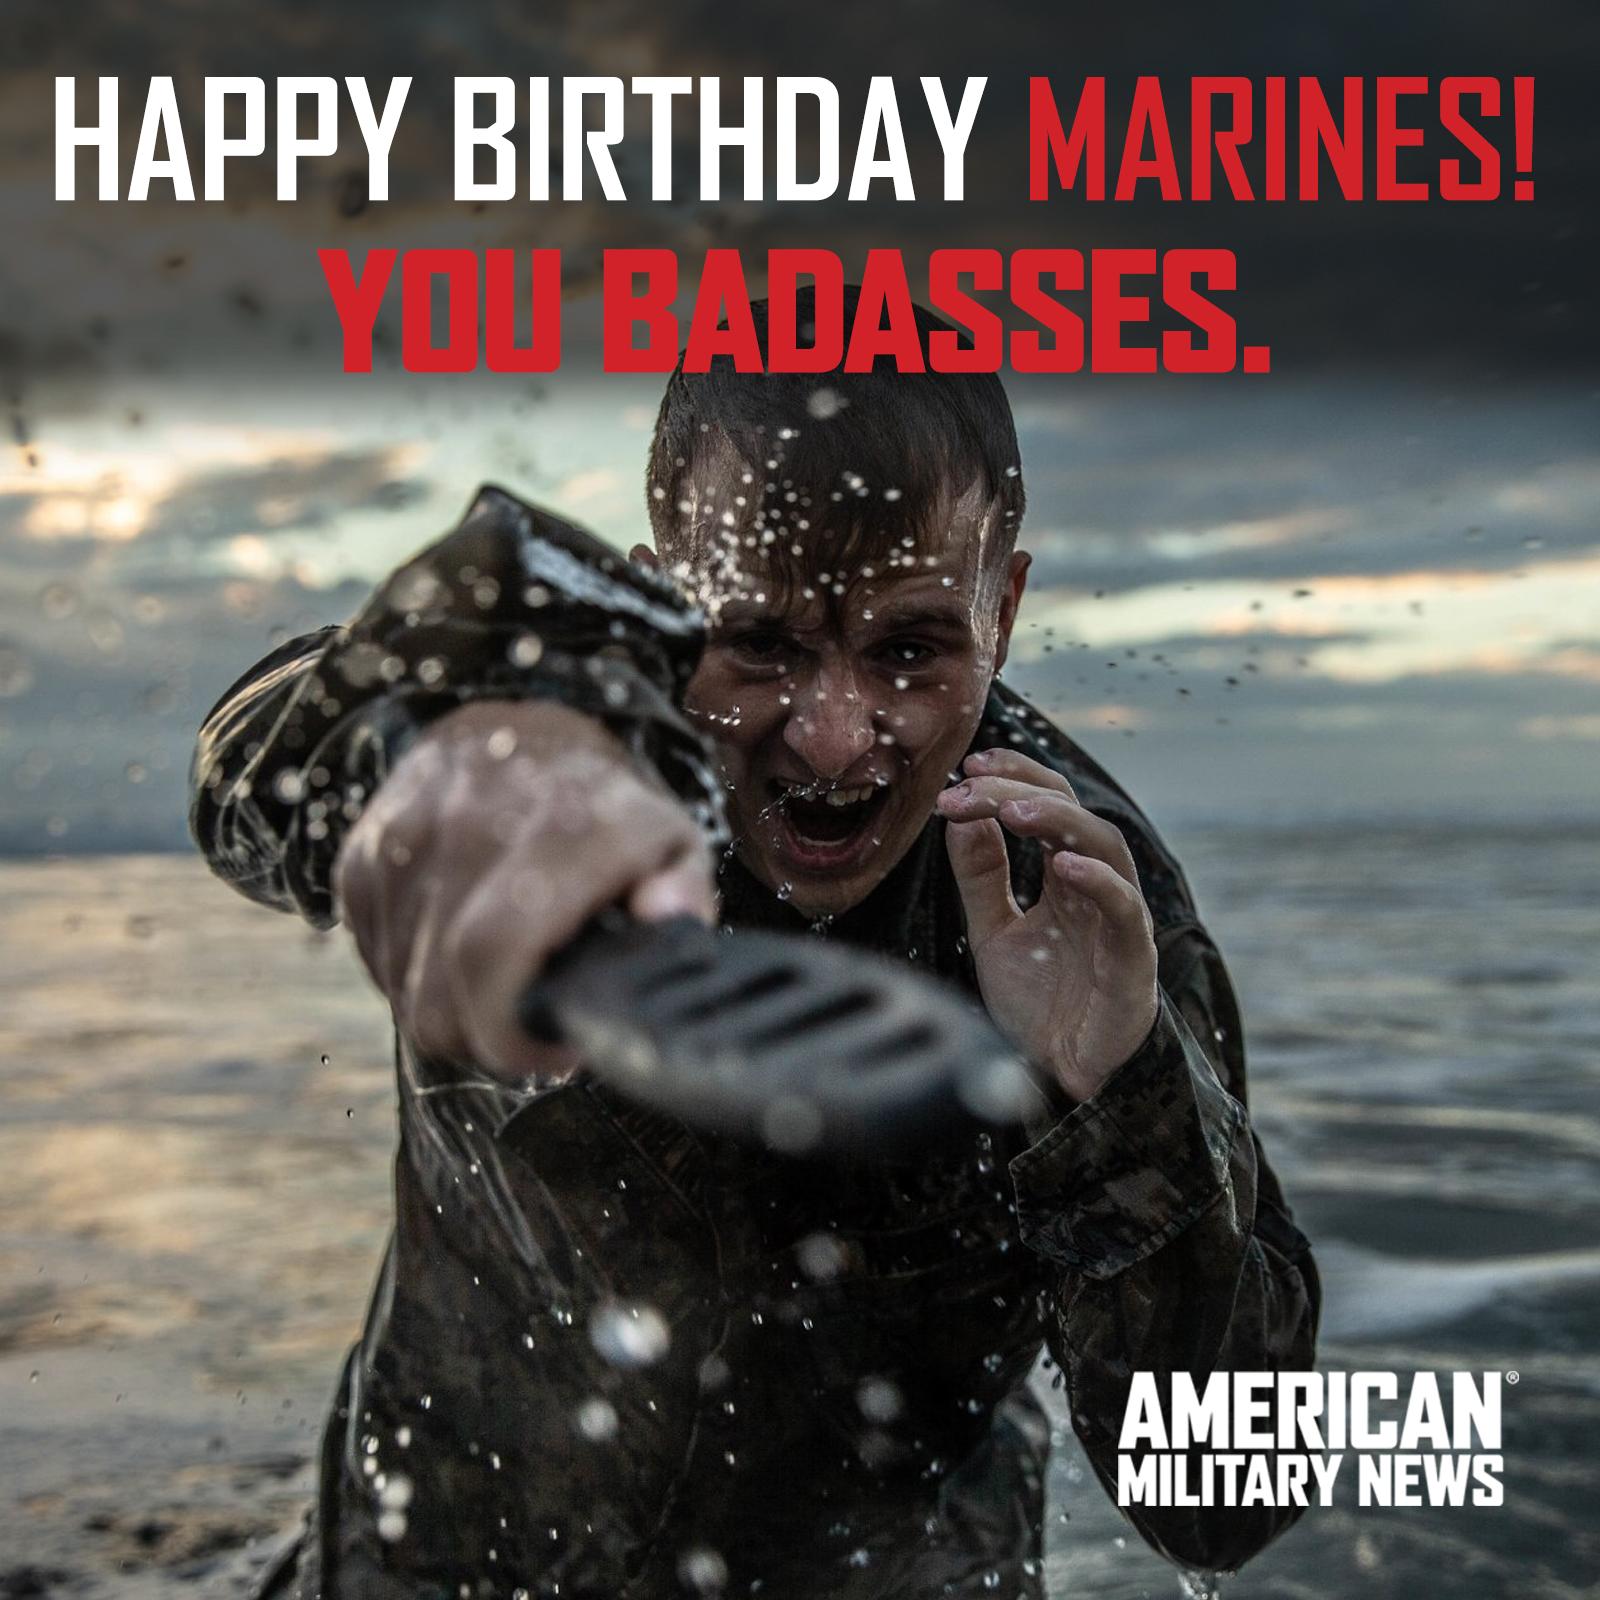 Happy Birthday U.S. Marine Corps